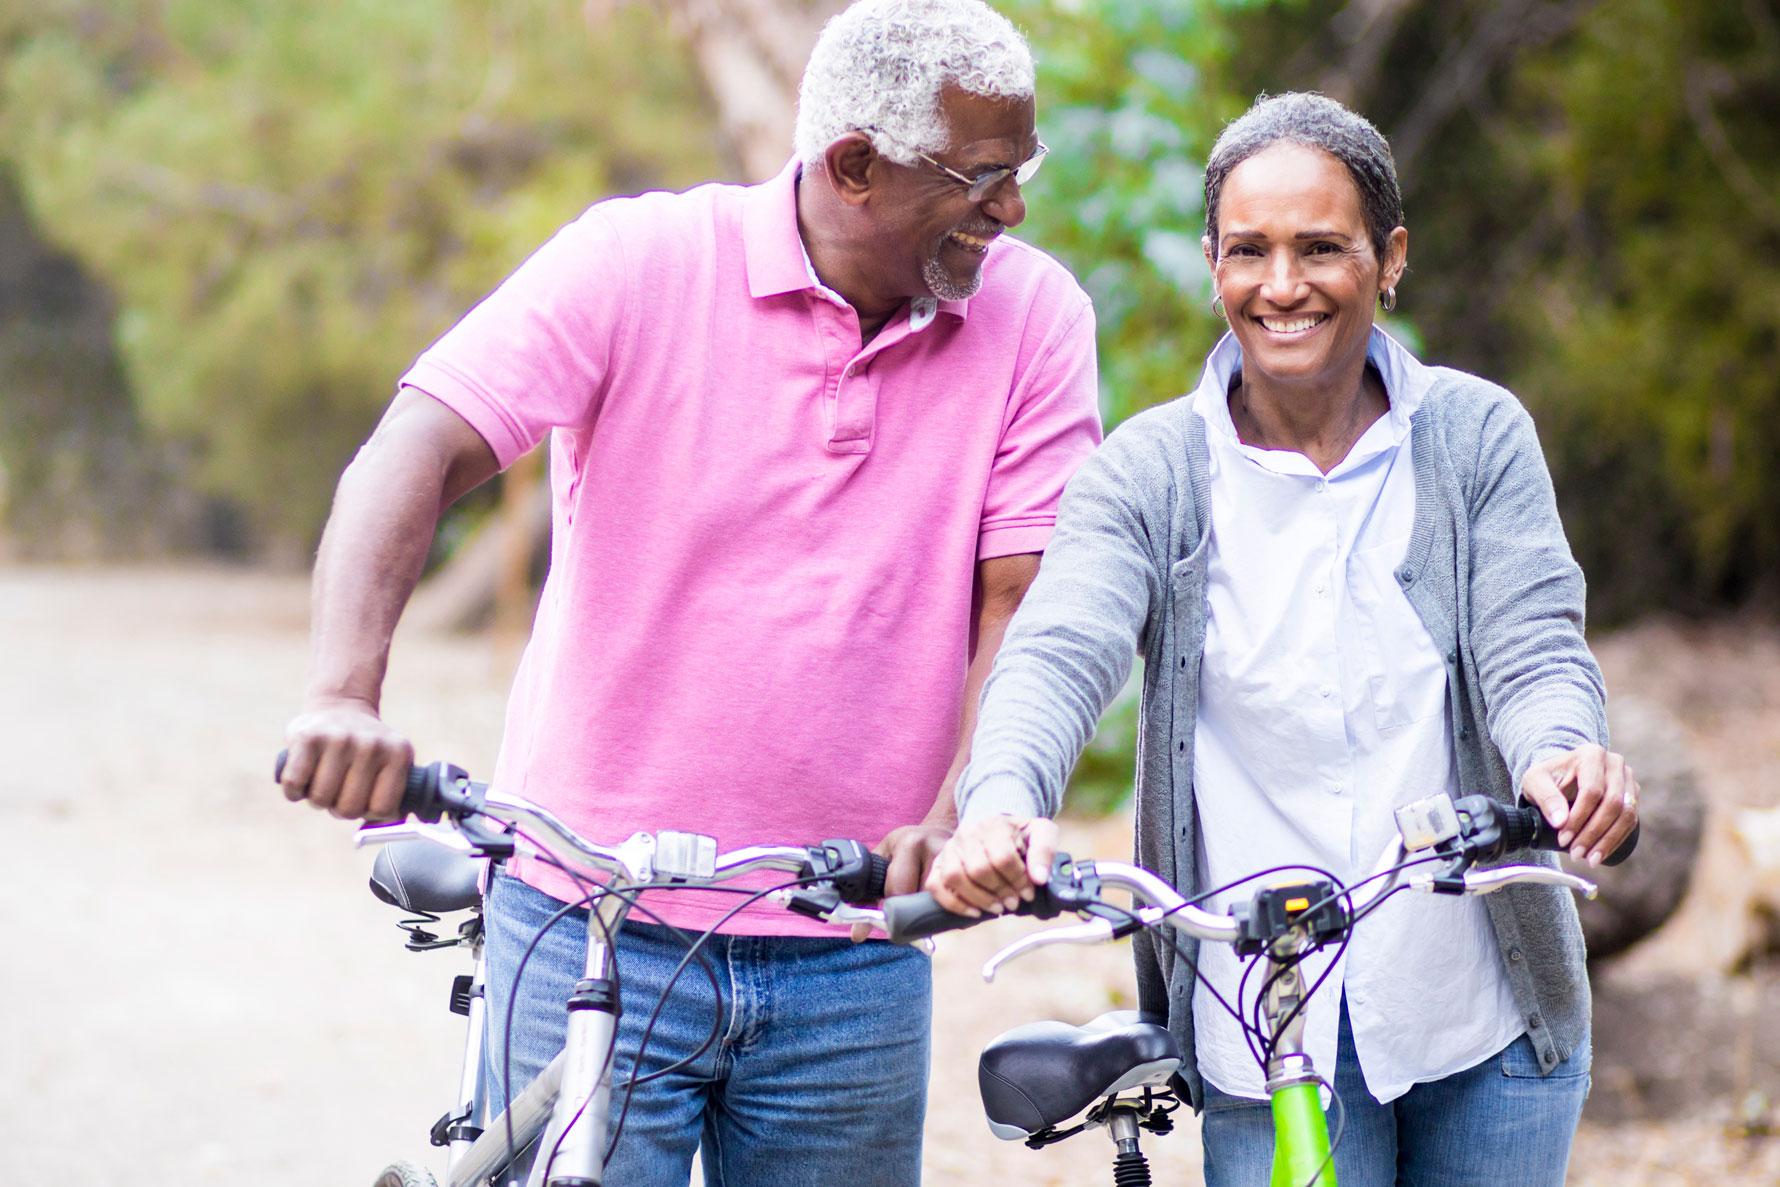 senior couple taking a bike ride